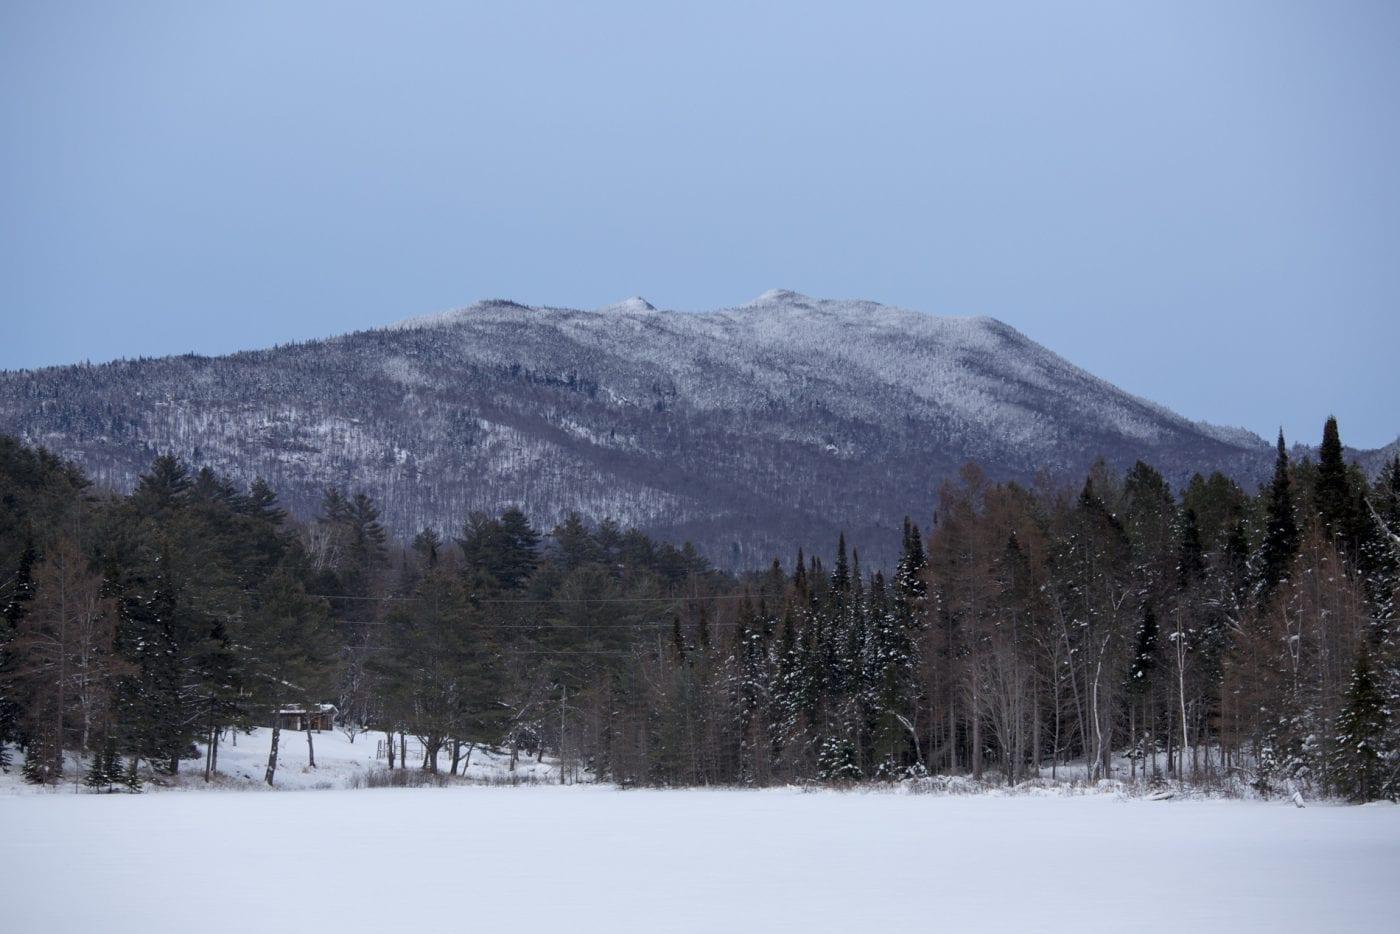 Snowy-Peaks-Adirondacks-Mike-Lynch-3